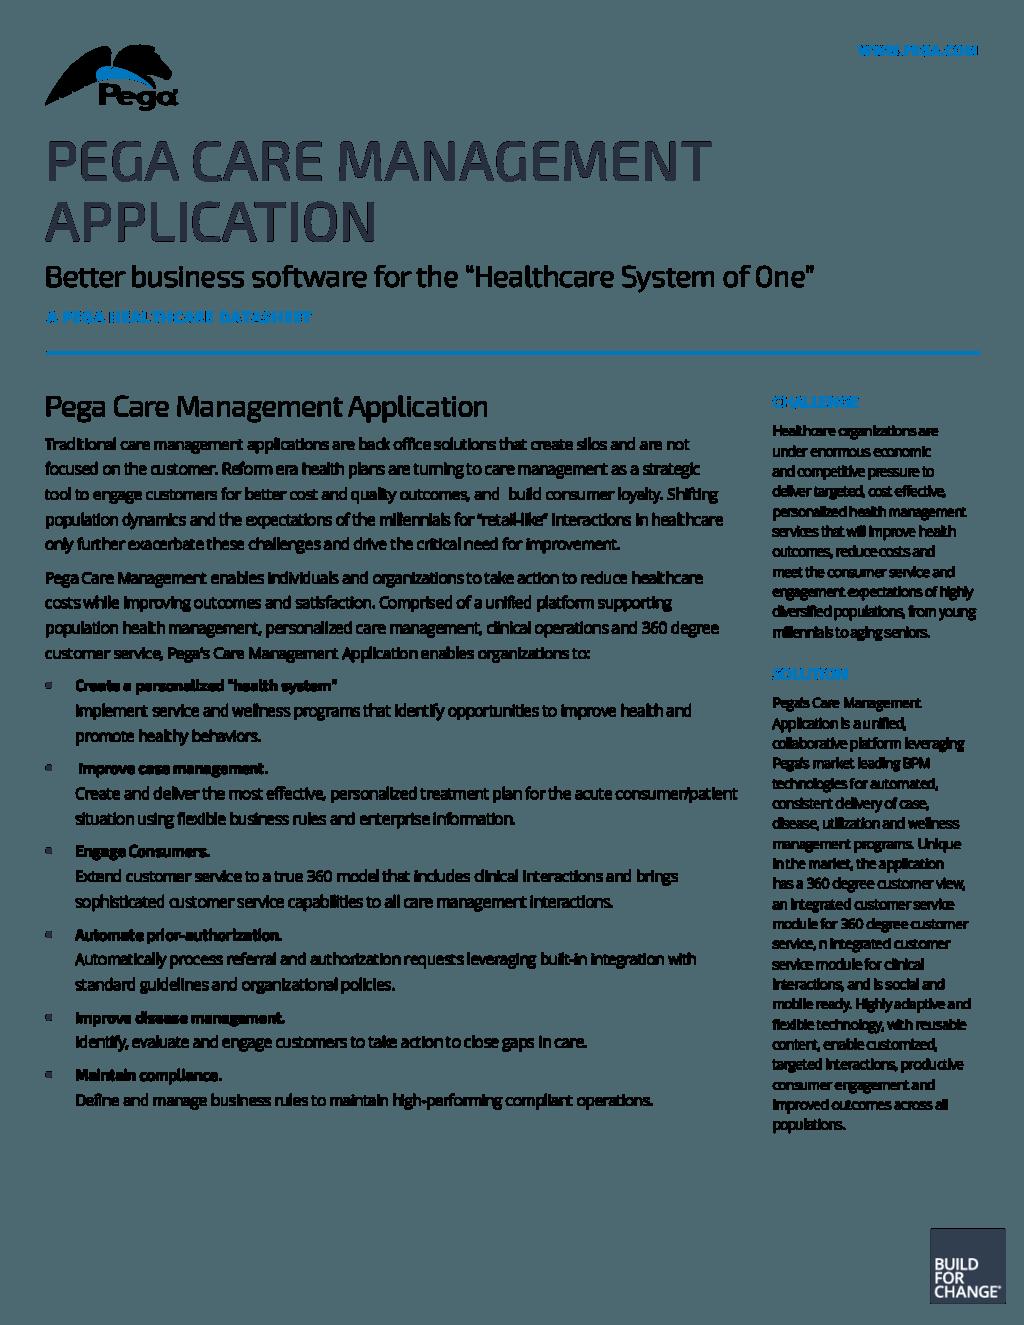 Pega Care Management Application | Pega